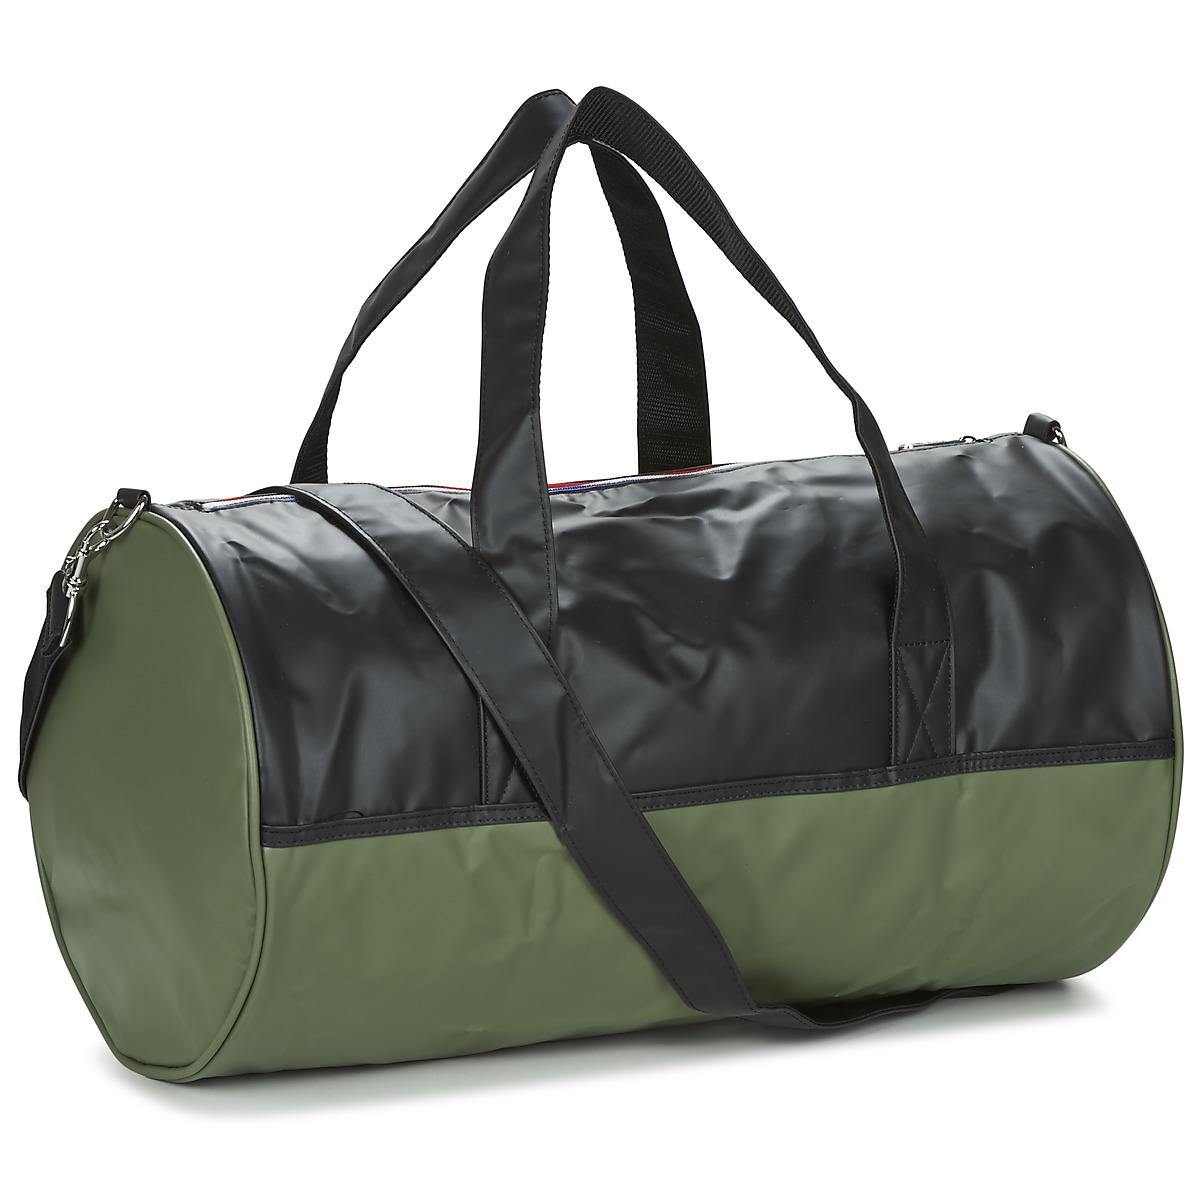 970893c79a4 Le Coq Sportif Edourine Men's Sports Bag In Black in Black for Men ...